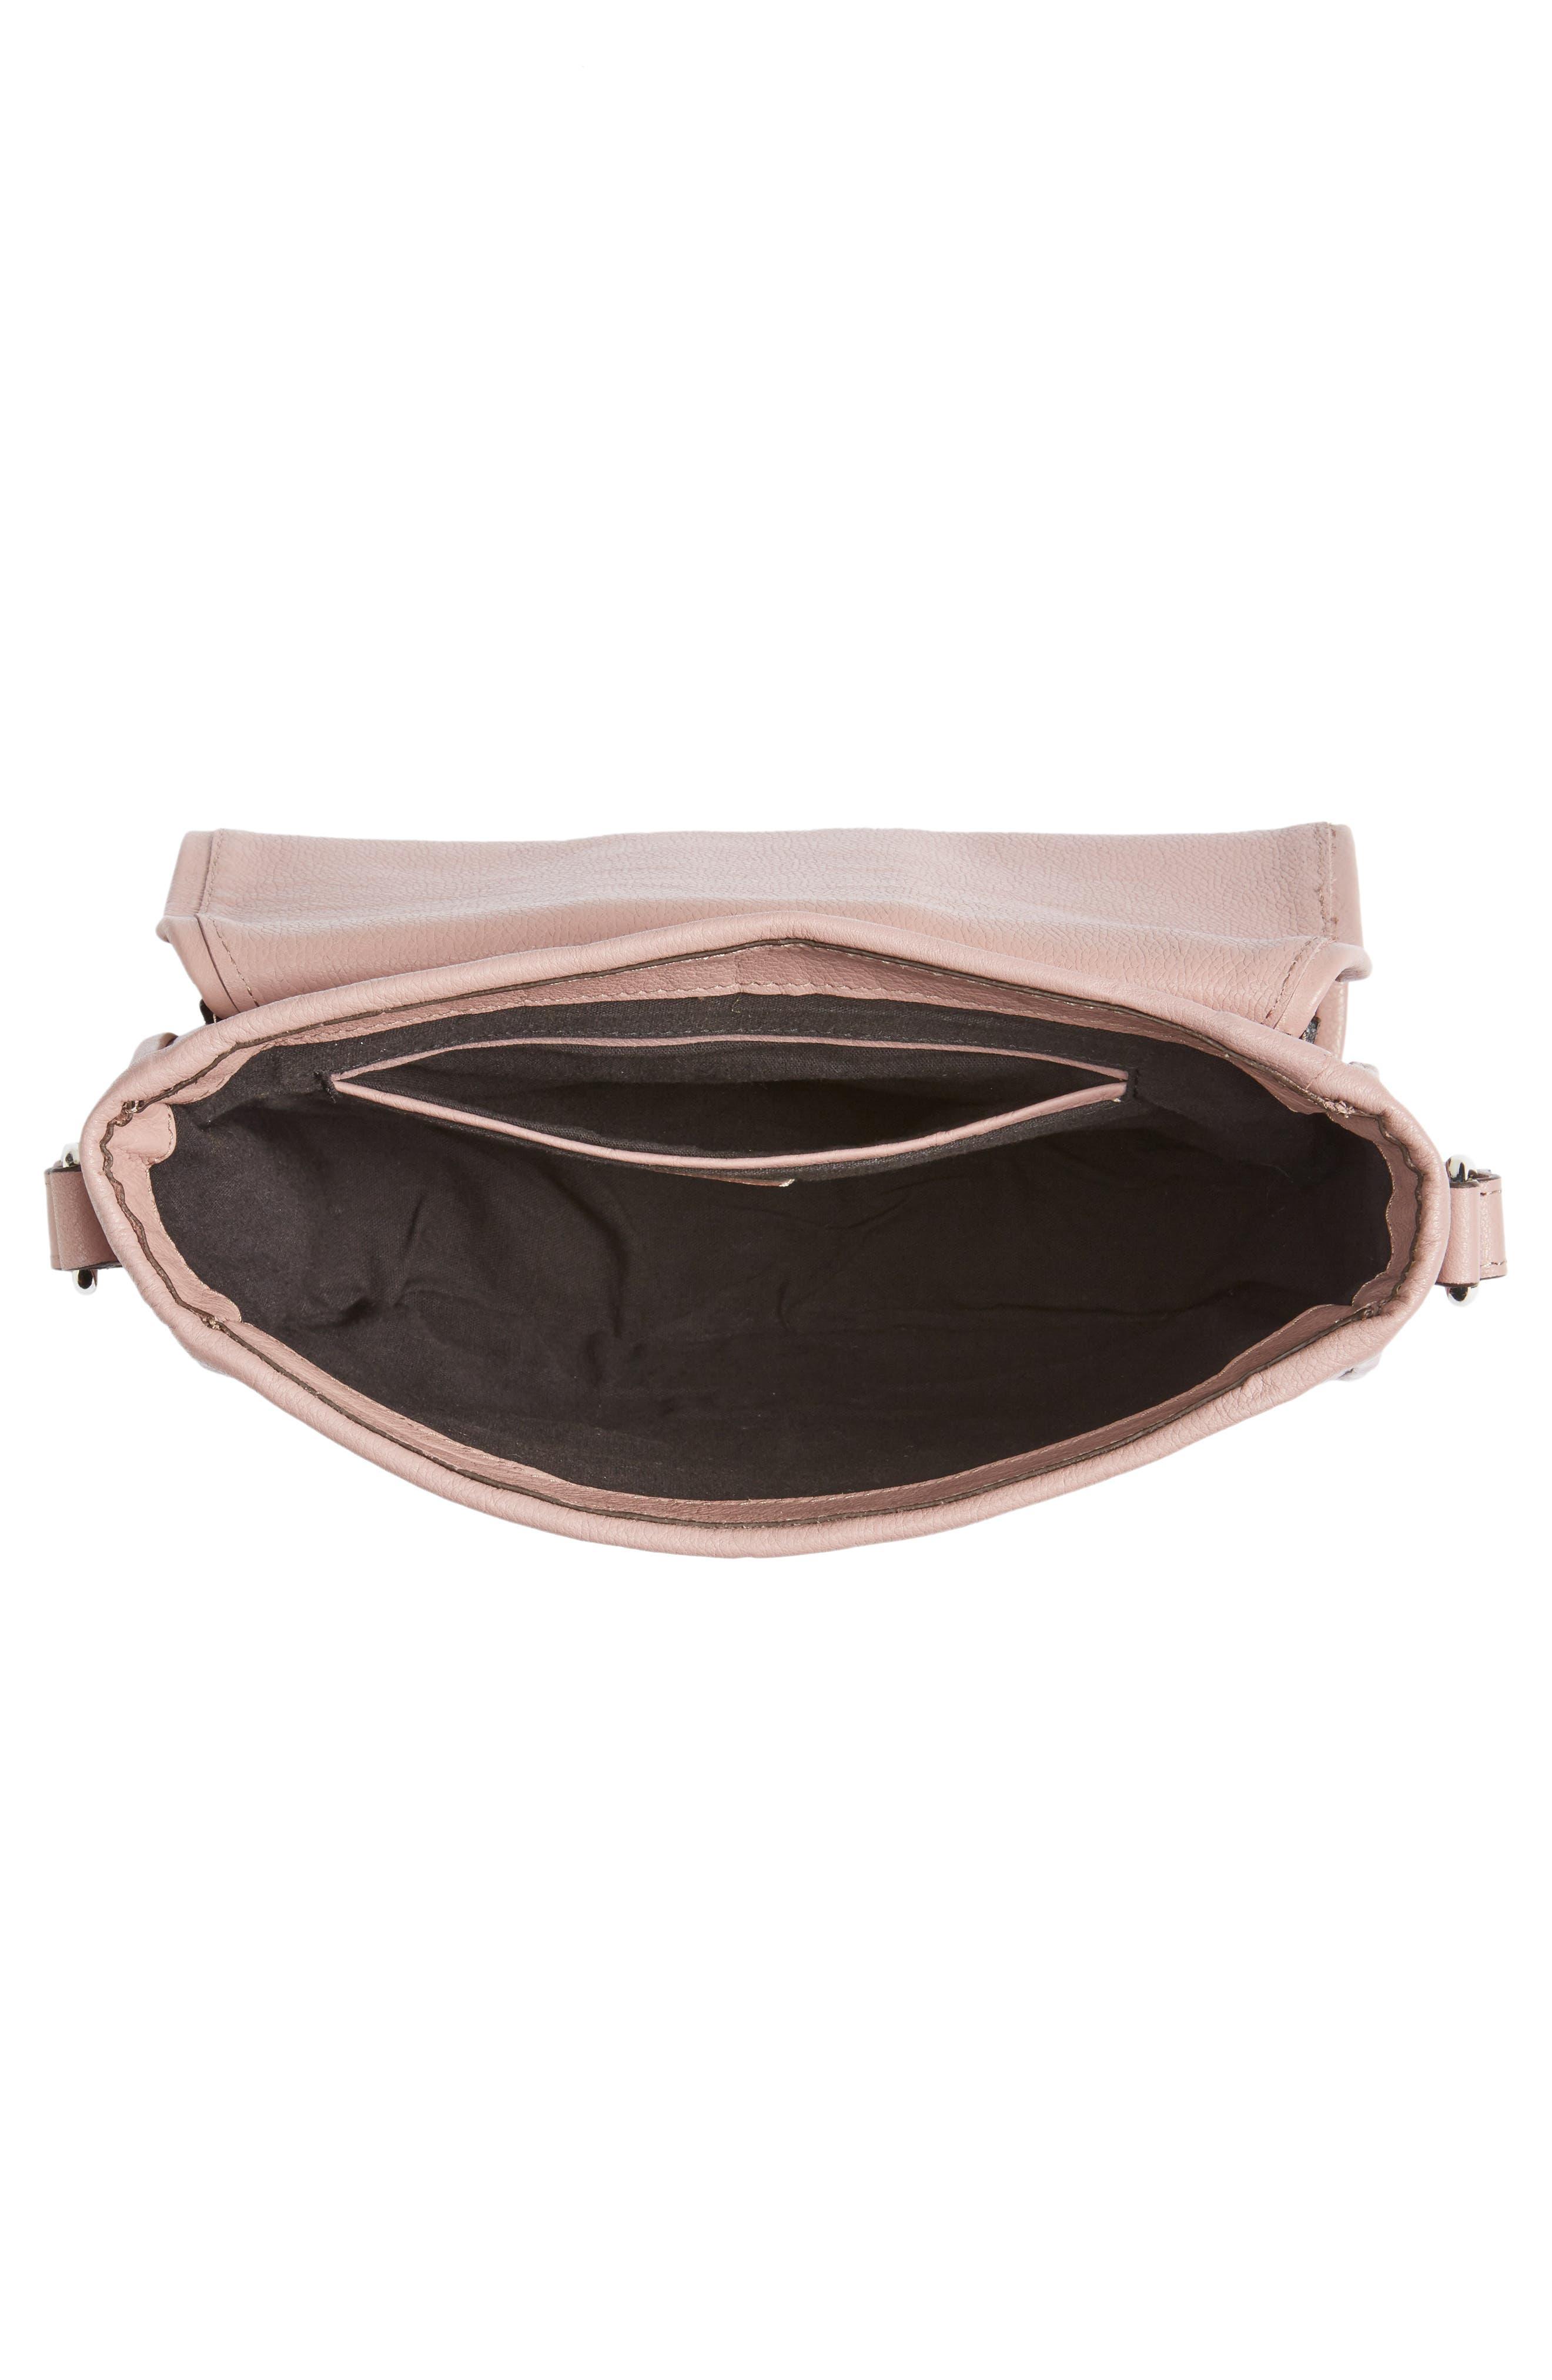 Premium Leather Studded Shoulder Bag,                             Alternate thumbnail 3, color,                             Blush